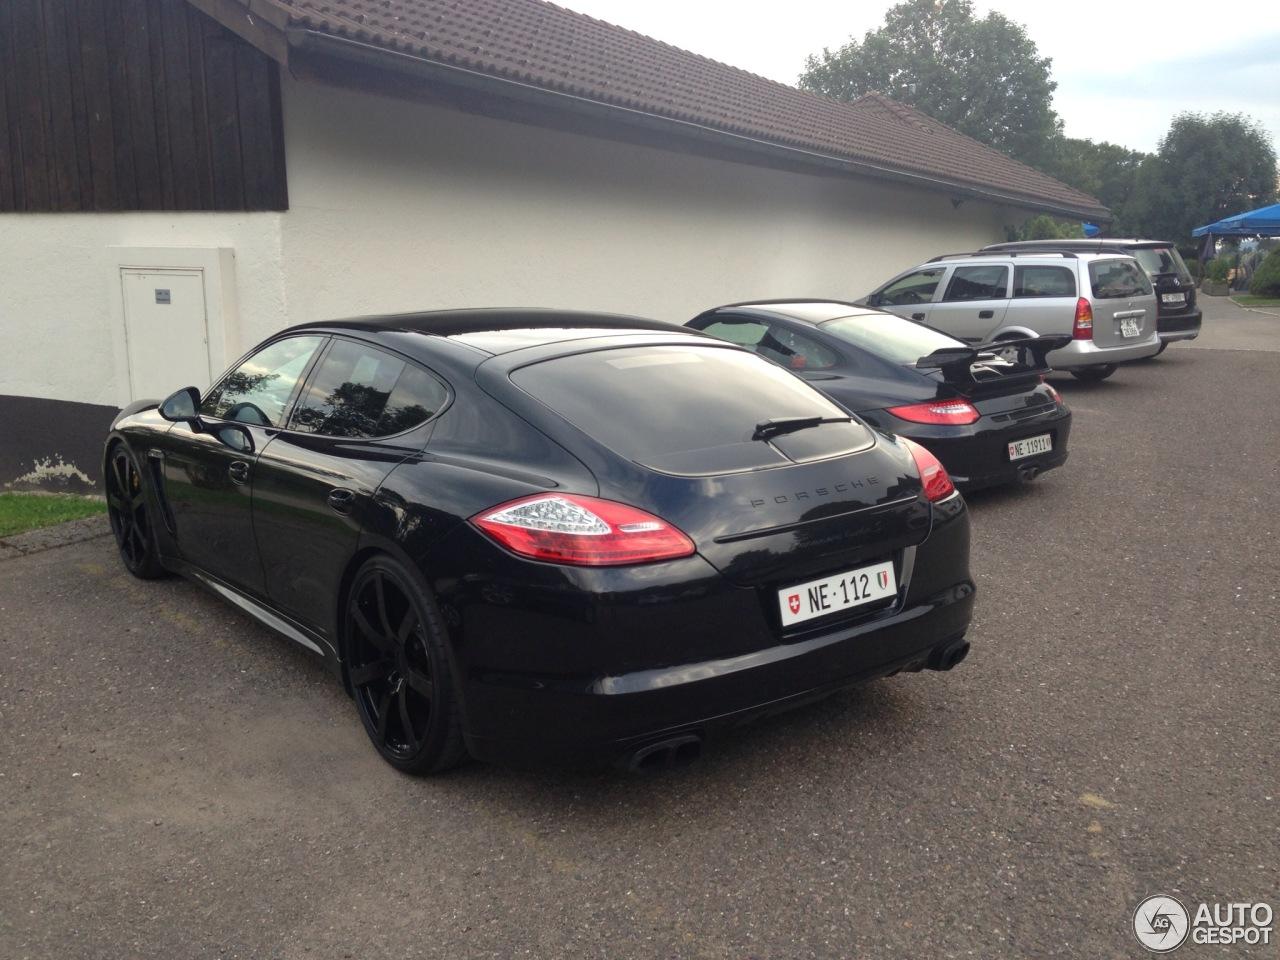 2012 Porsche Panamera Turbo S Black on Black 550 hp BEAST ...